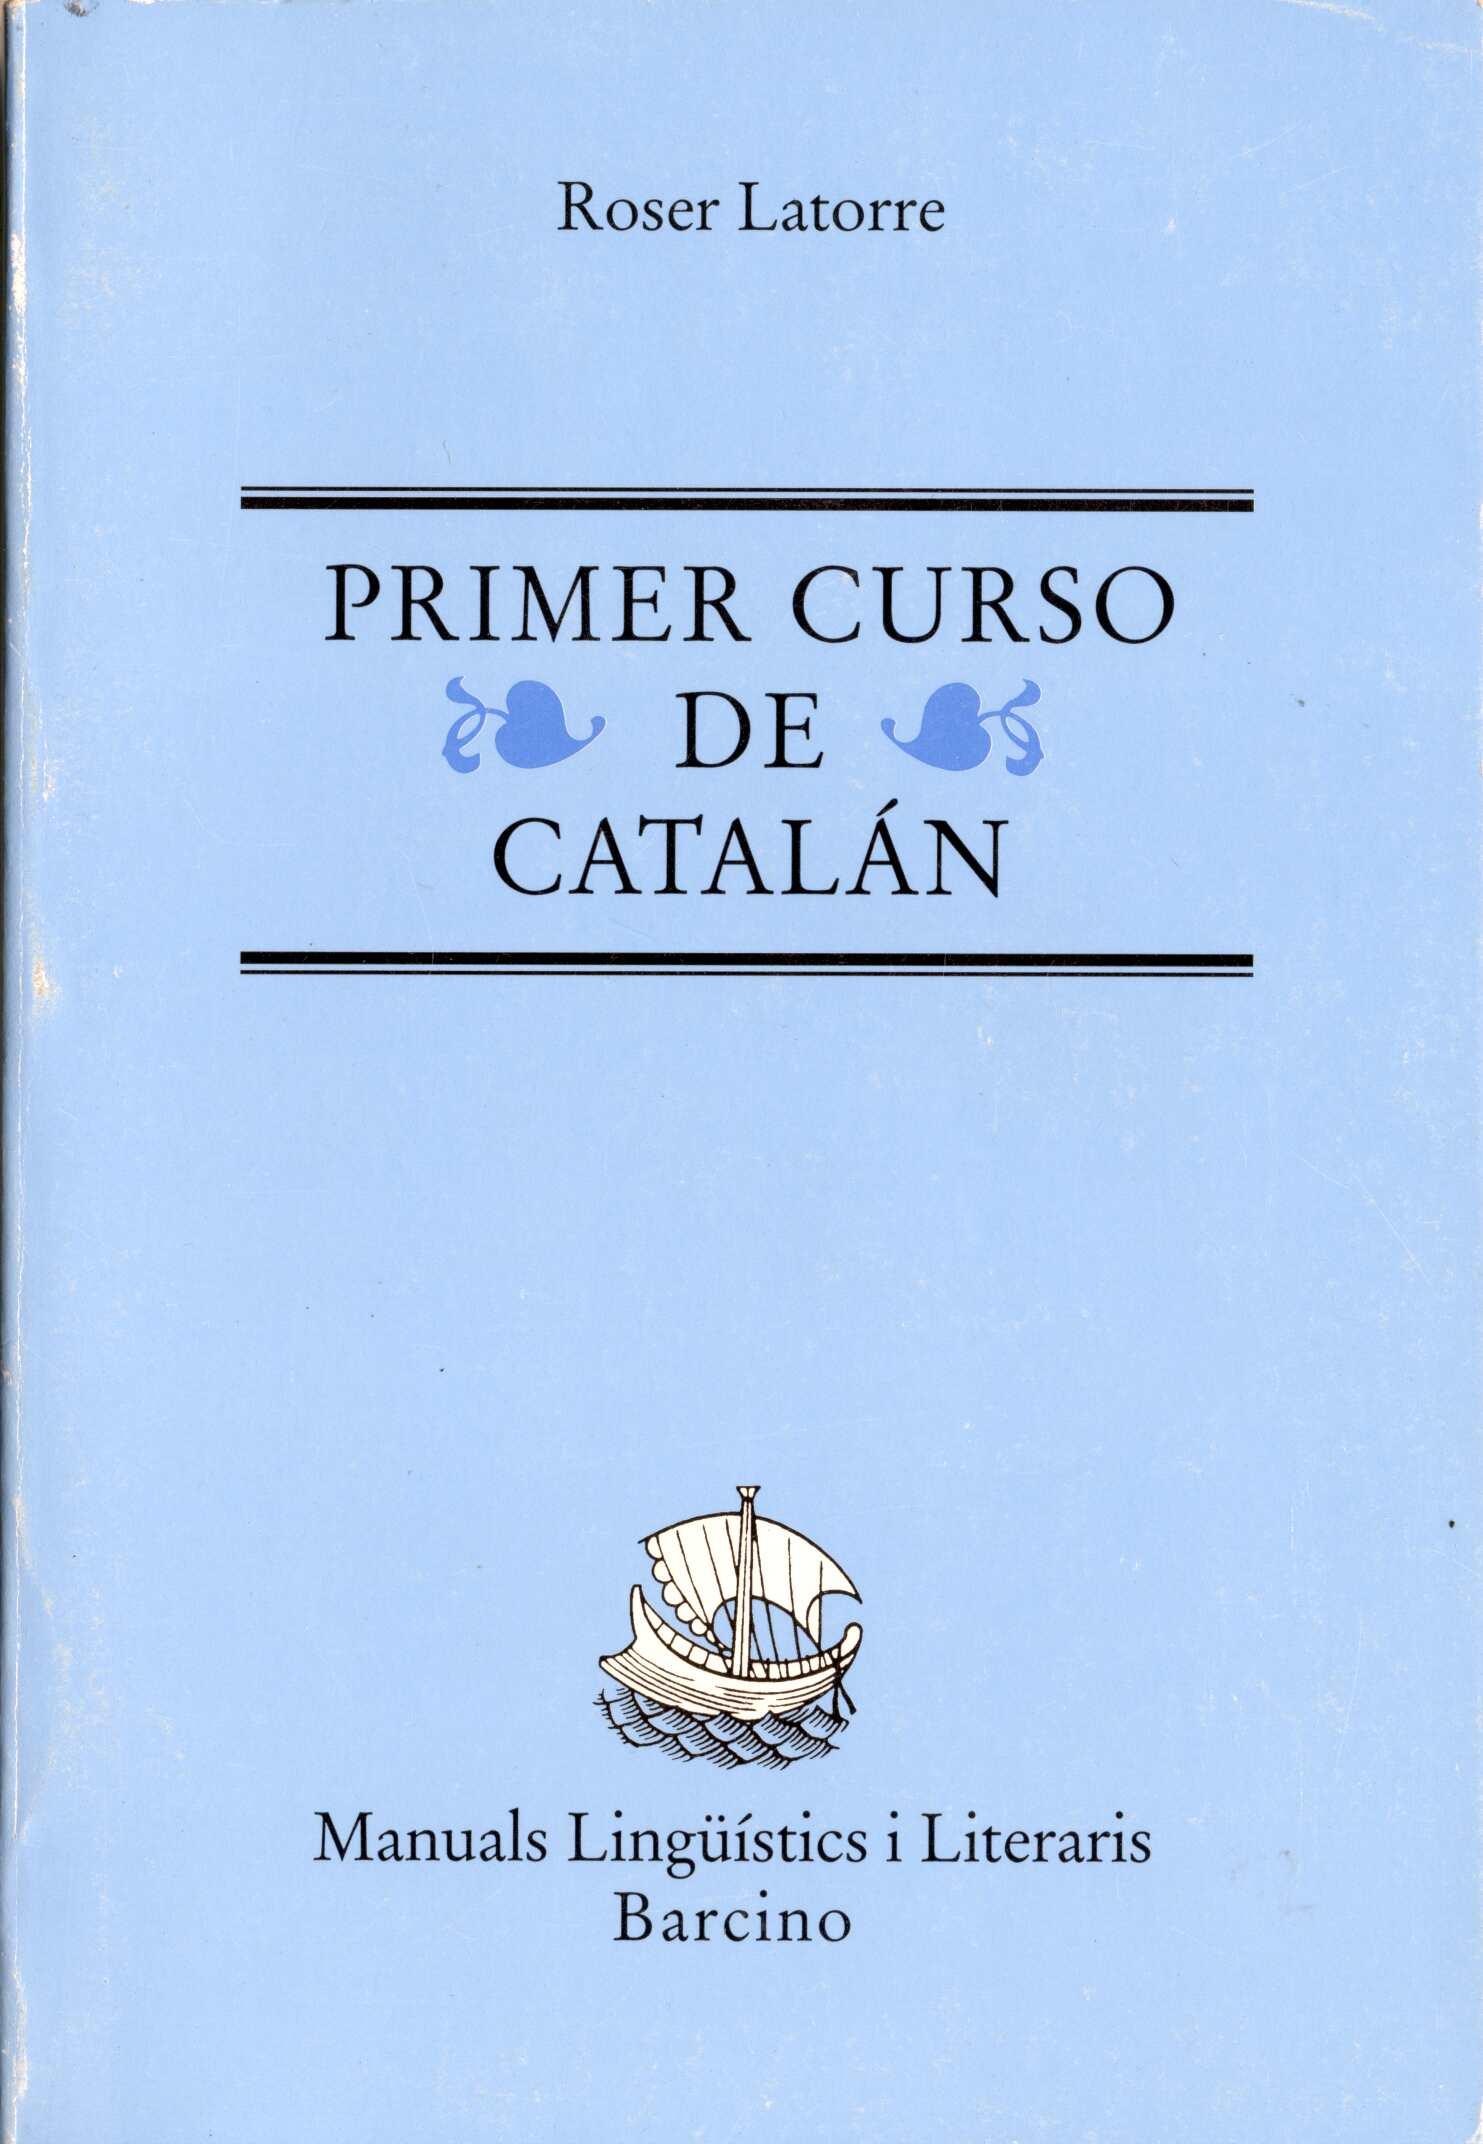 Primer curso de Catalán